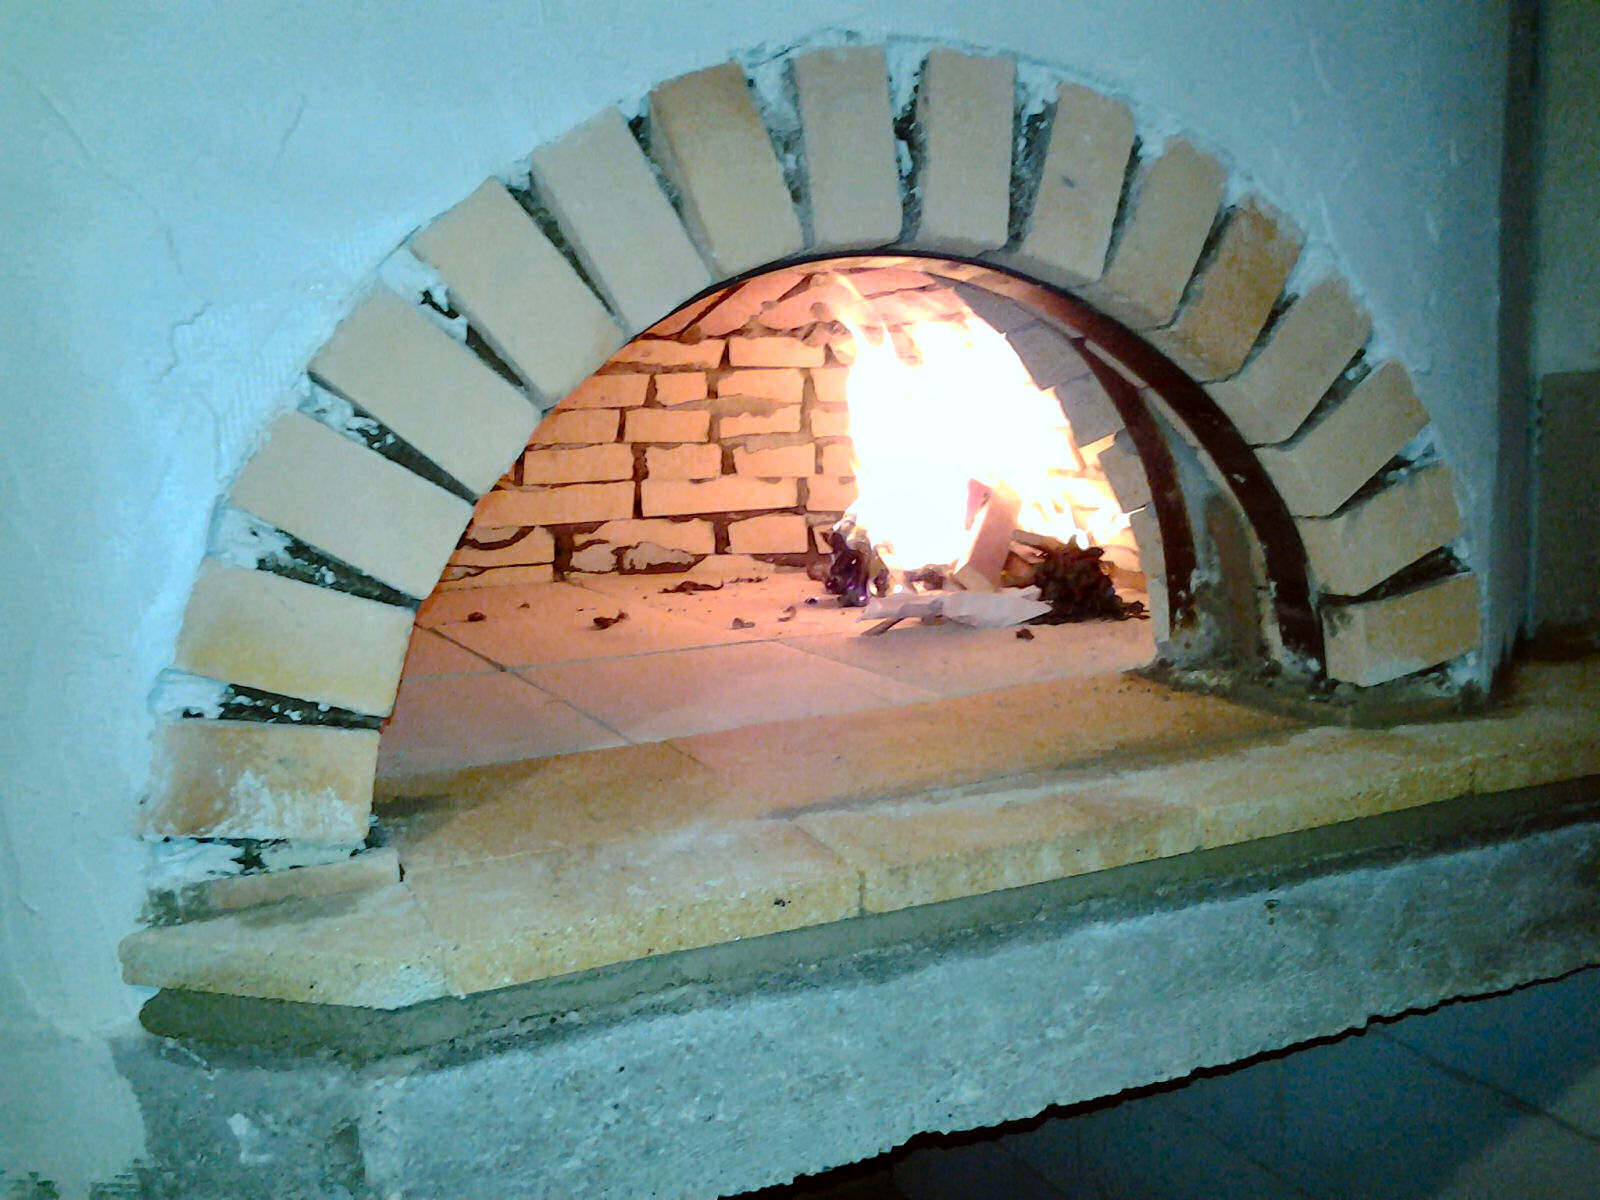 pizzeria-pri-daretu-wood-fired-pizza-oven